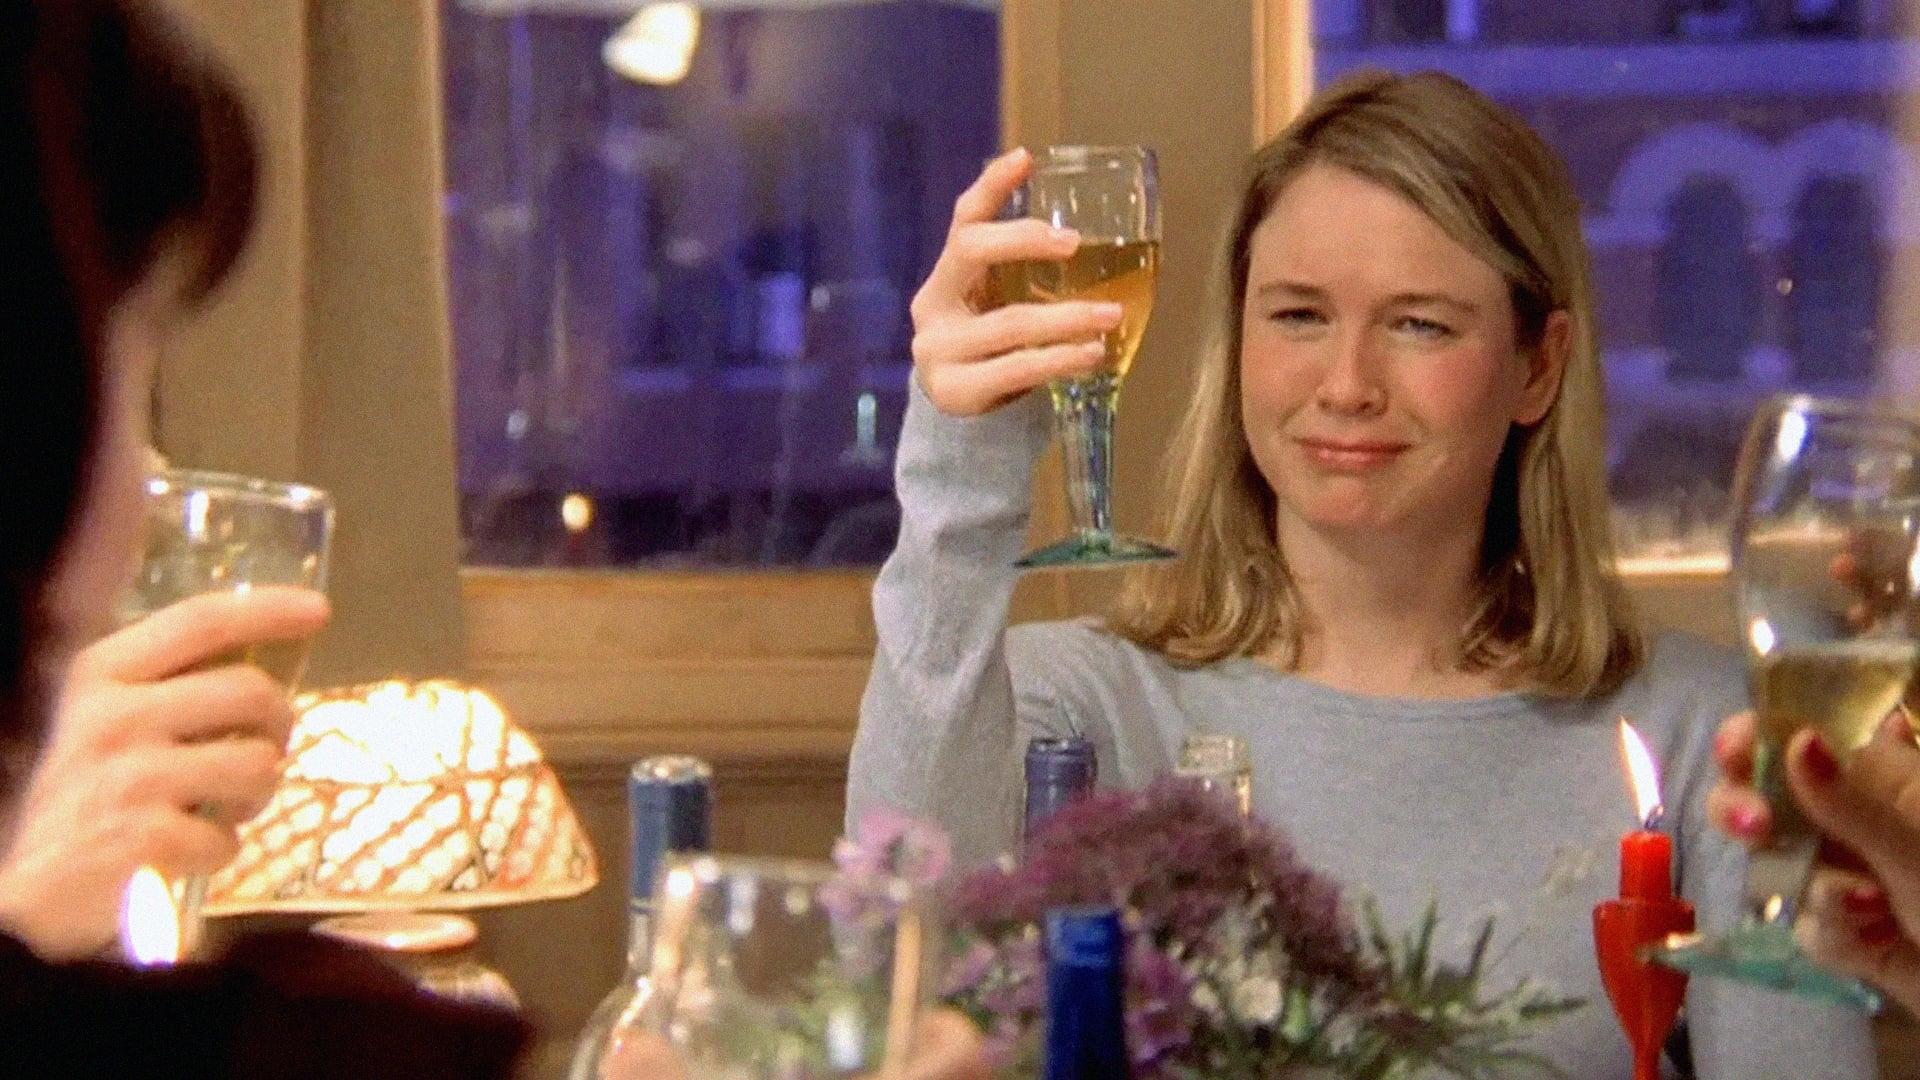 Escena de la pelicula romántica Bridget Jones